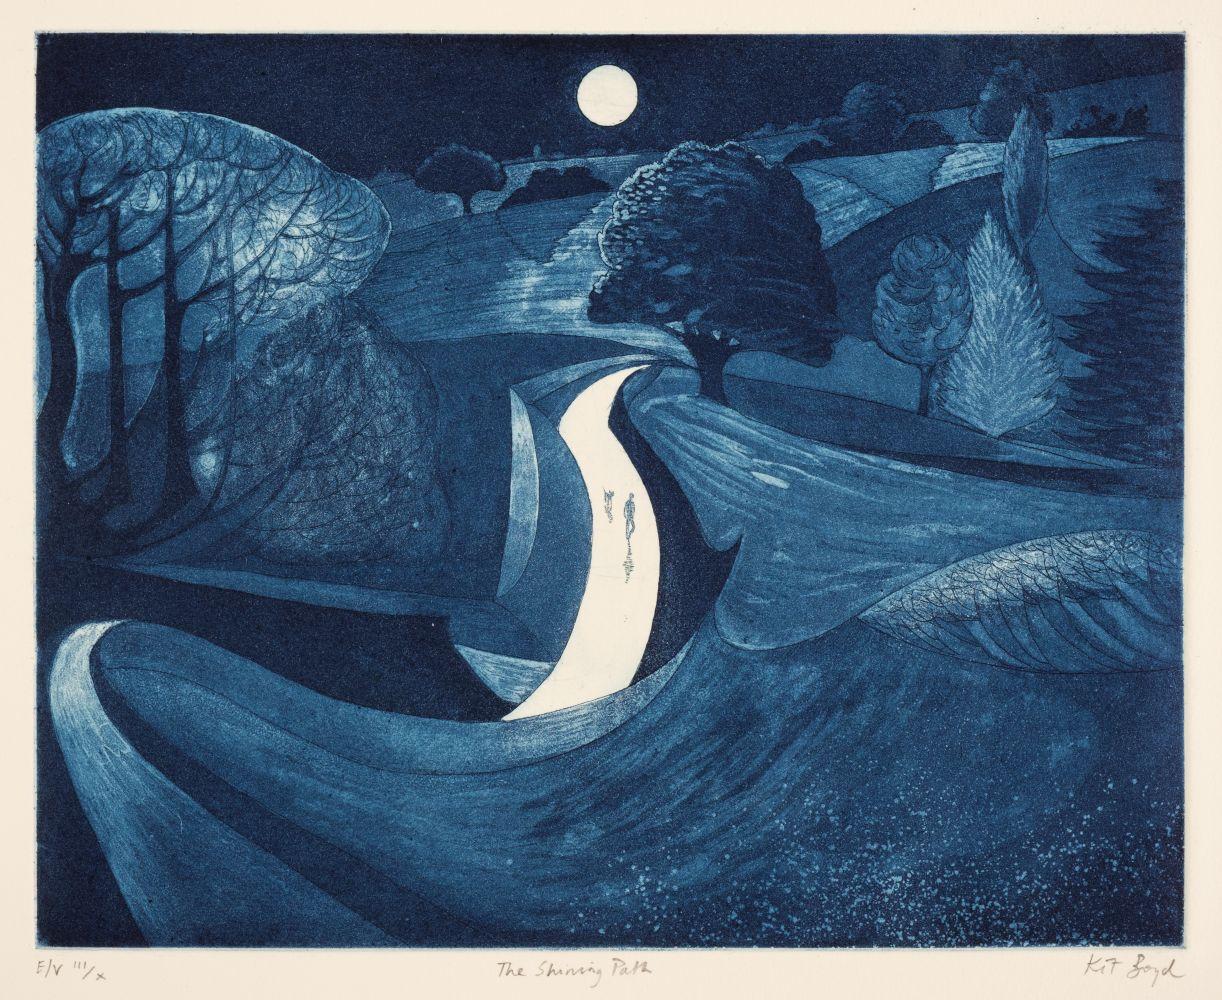 * Boyd (Kit, 1970-). The Shining Path, 2012